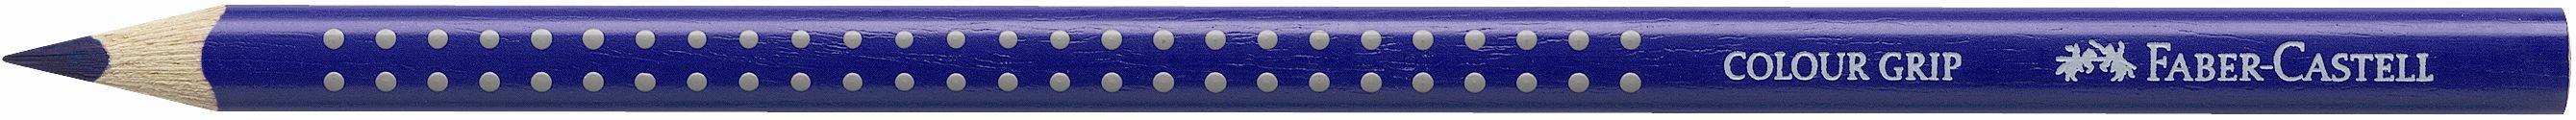 Pastelka Color Grip / 137 modro fialová Faber Castell - Akvarelové pastelky Faber Castell - Akvarelové pastelky